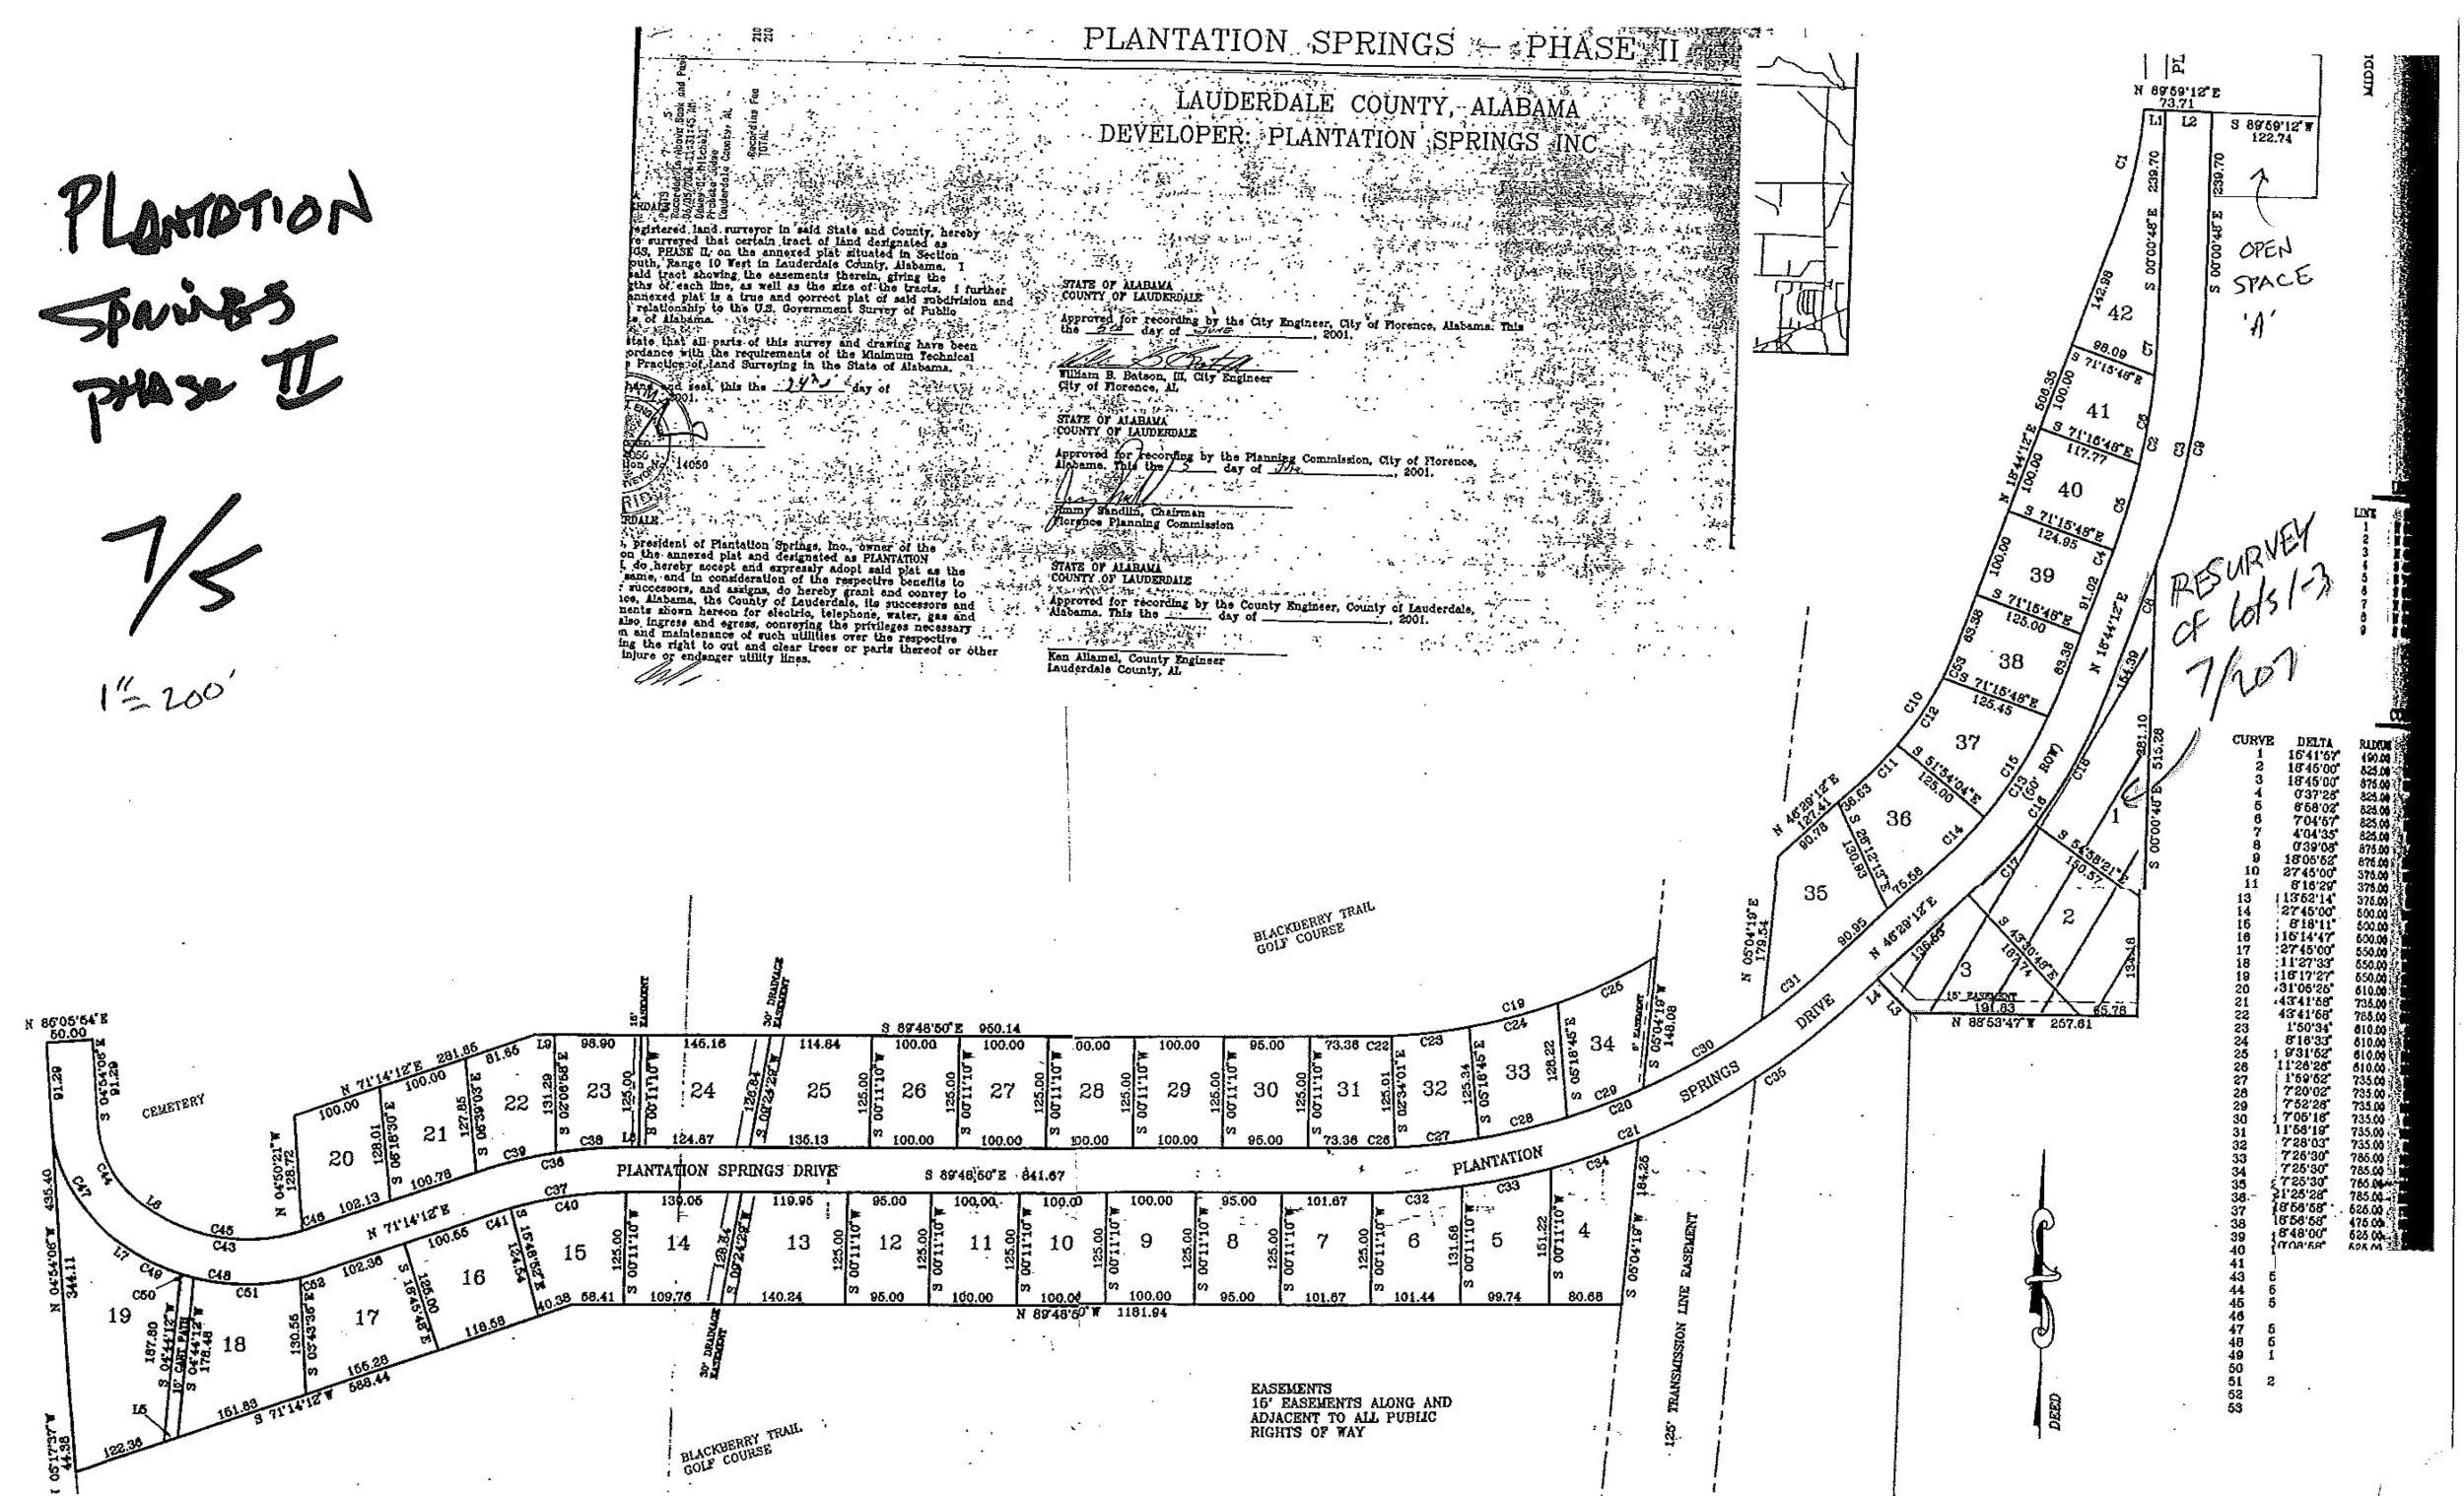 plantation springs phase 2-plats-1.jpg